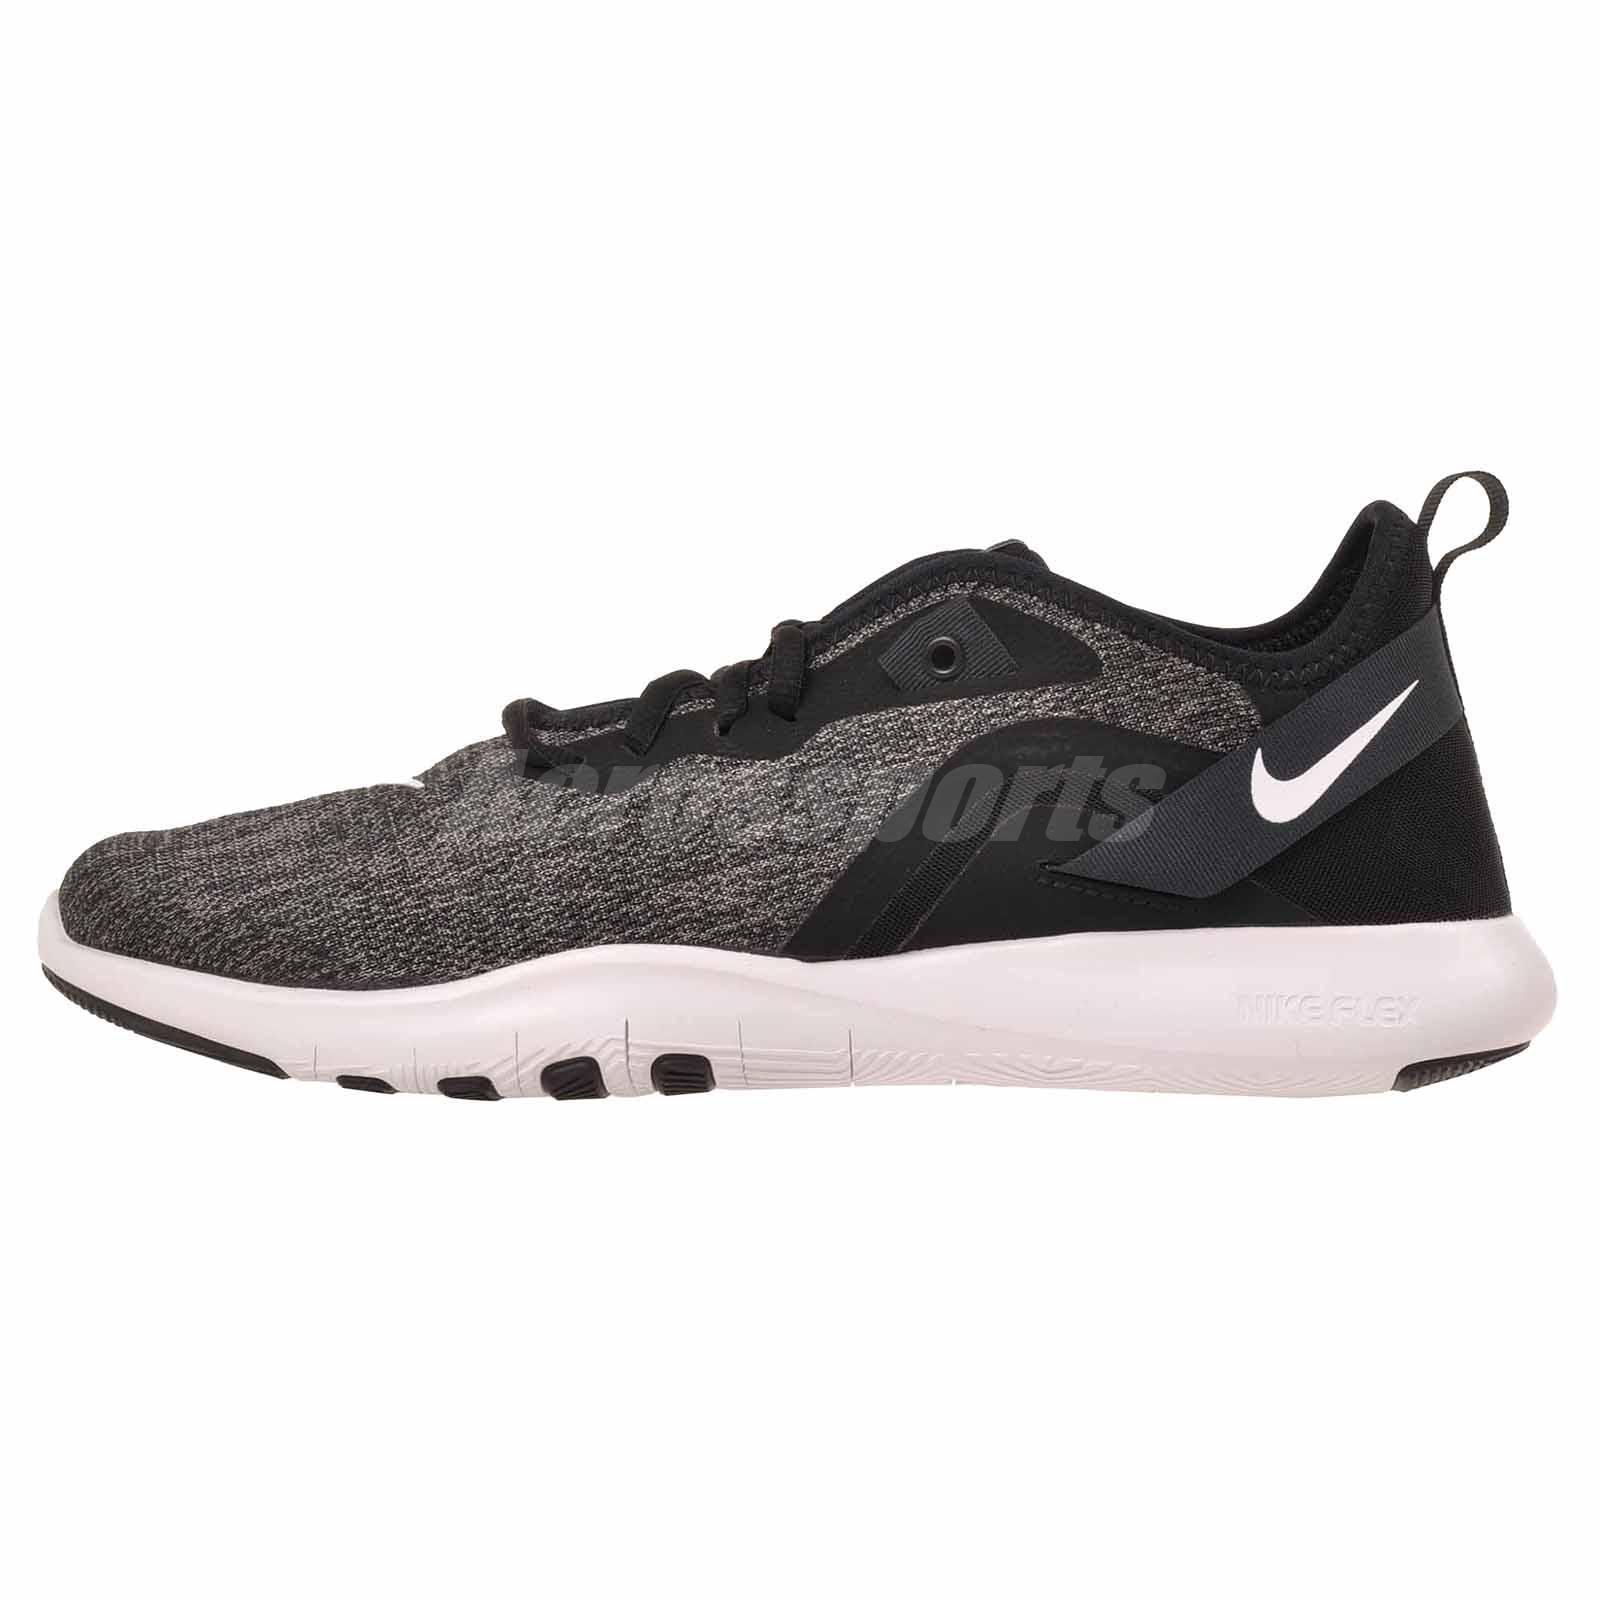 habla Alternativa entrega  Nike Wmns Flex Trainer 9 Cross Training Womens Shoes Black White AQ7491-002  | eBay